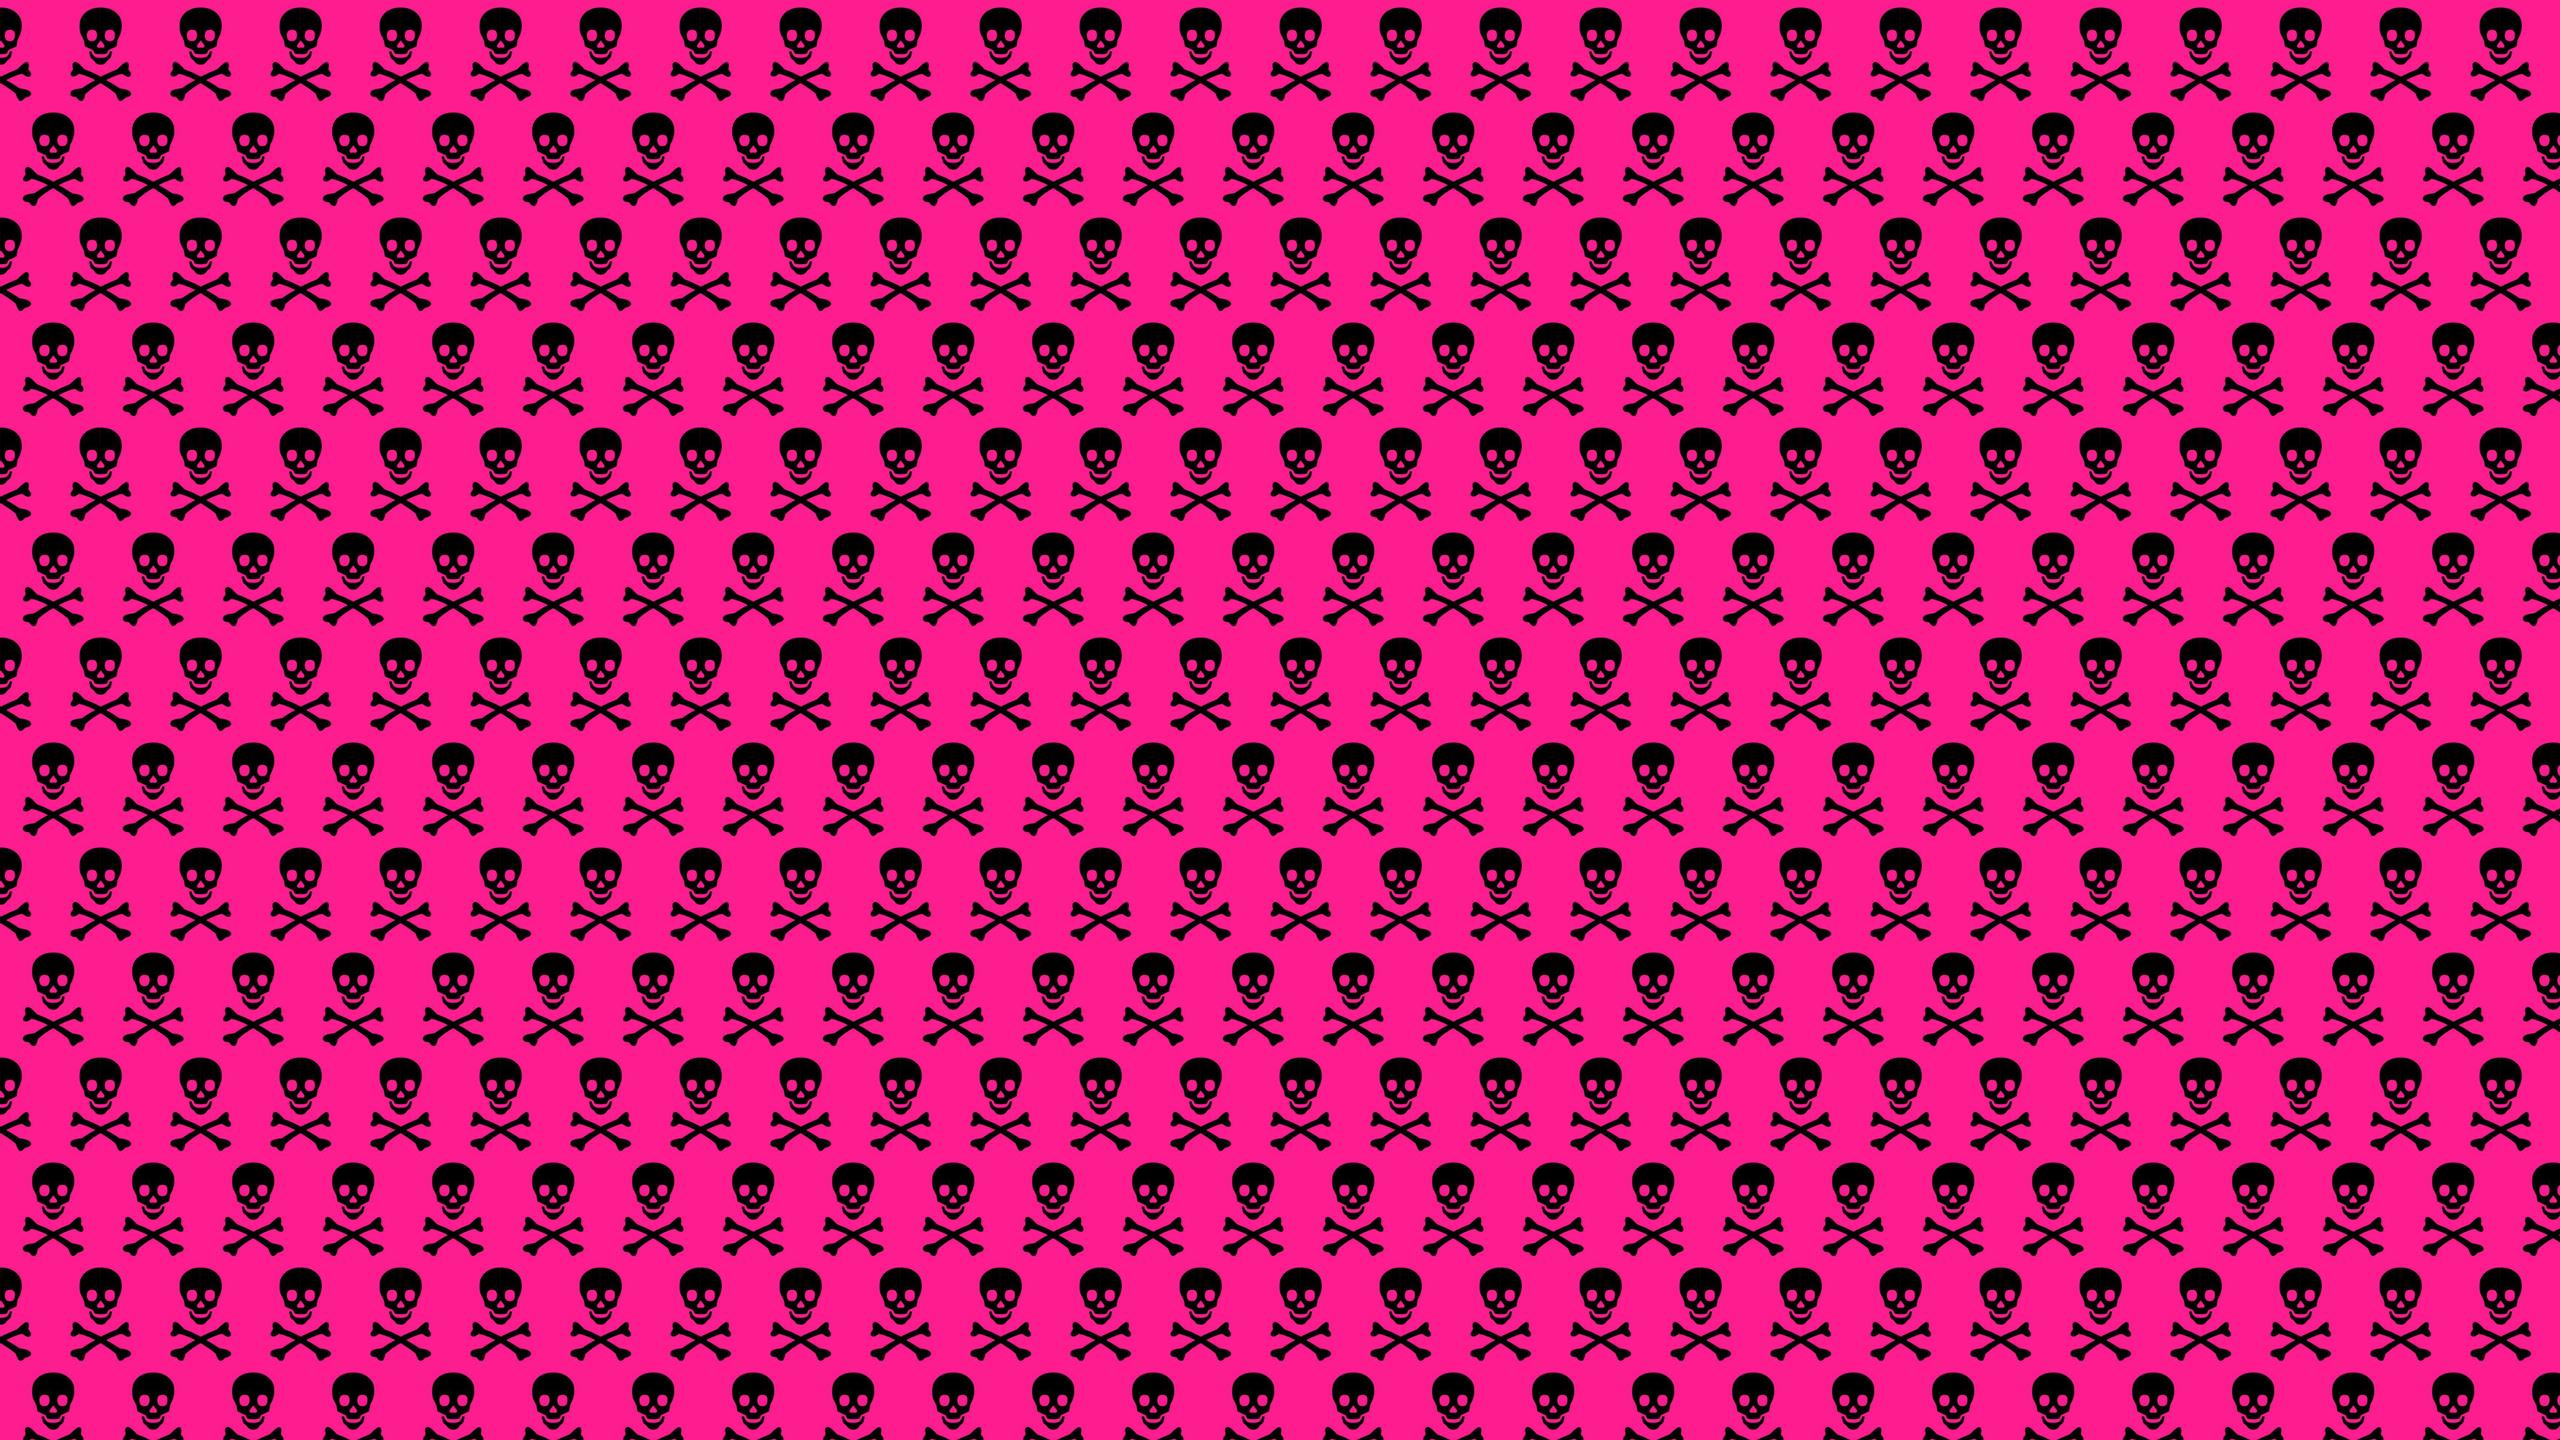 Skull Crossbones Desktop Wallpaper is easy Just save the wallpaper 2560x1440